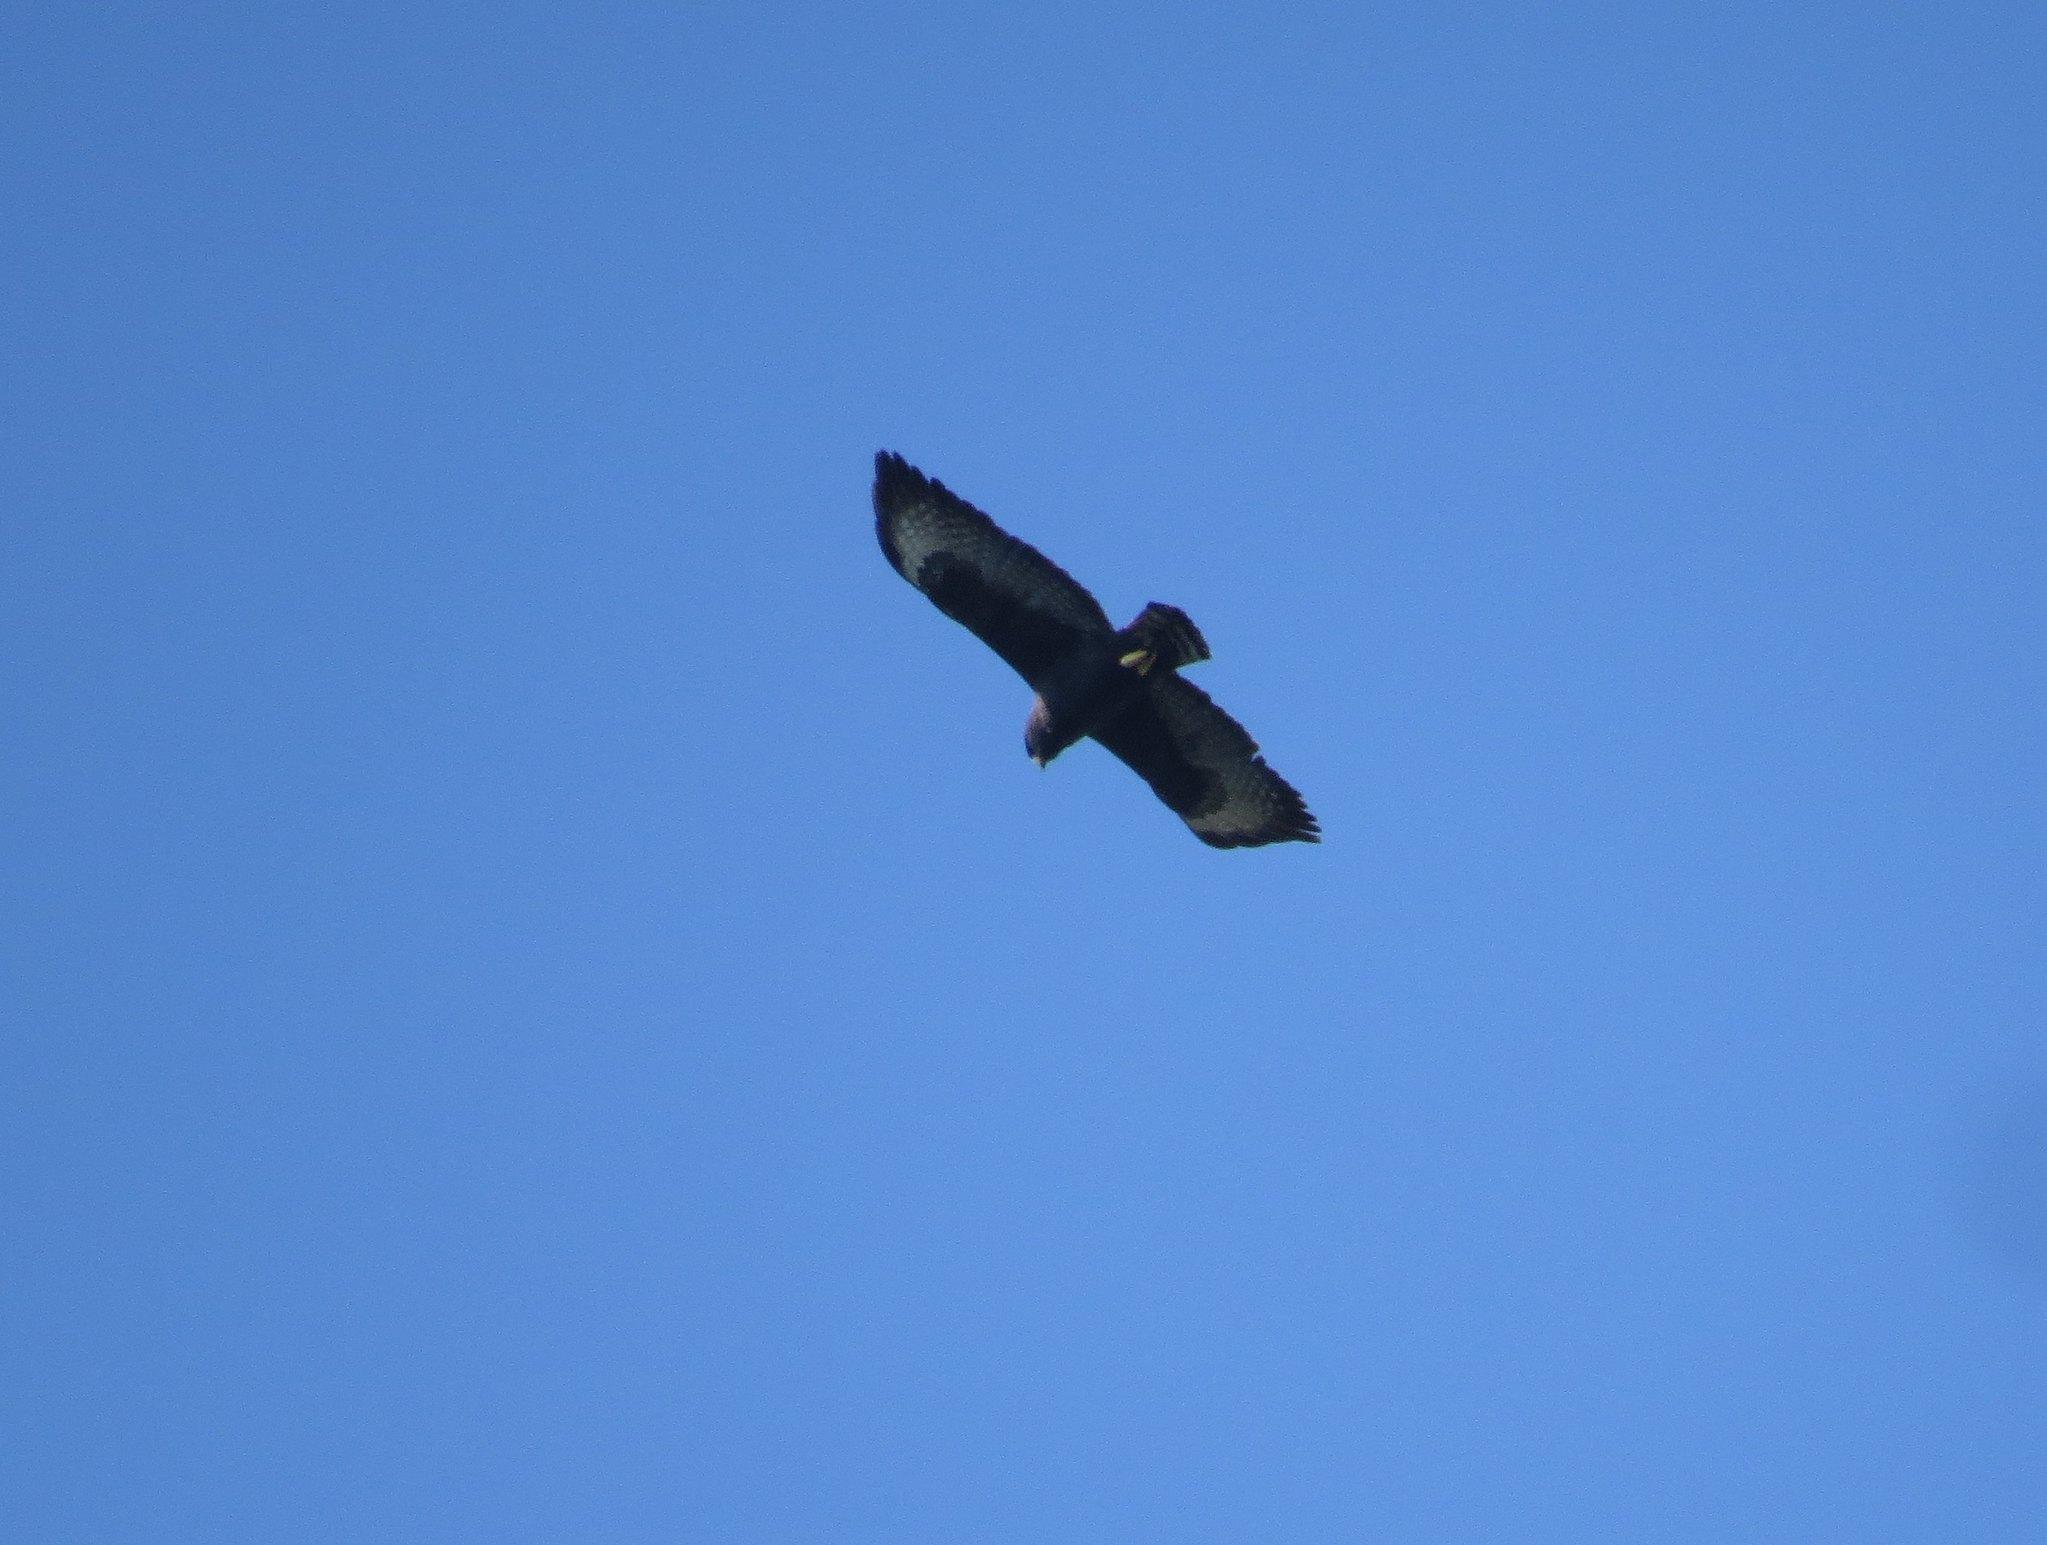 Zone-tailed Hawk by Seth Inman - La Paz Group